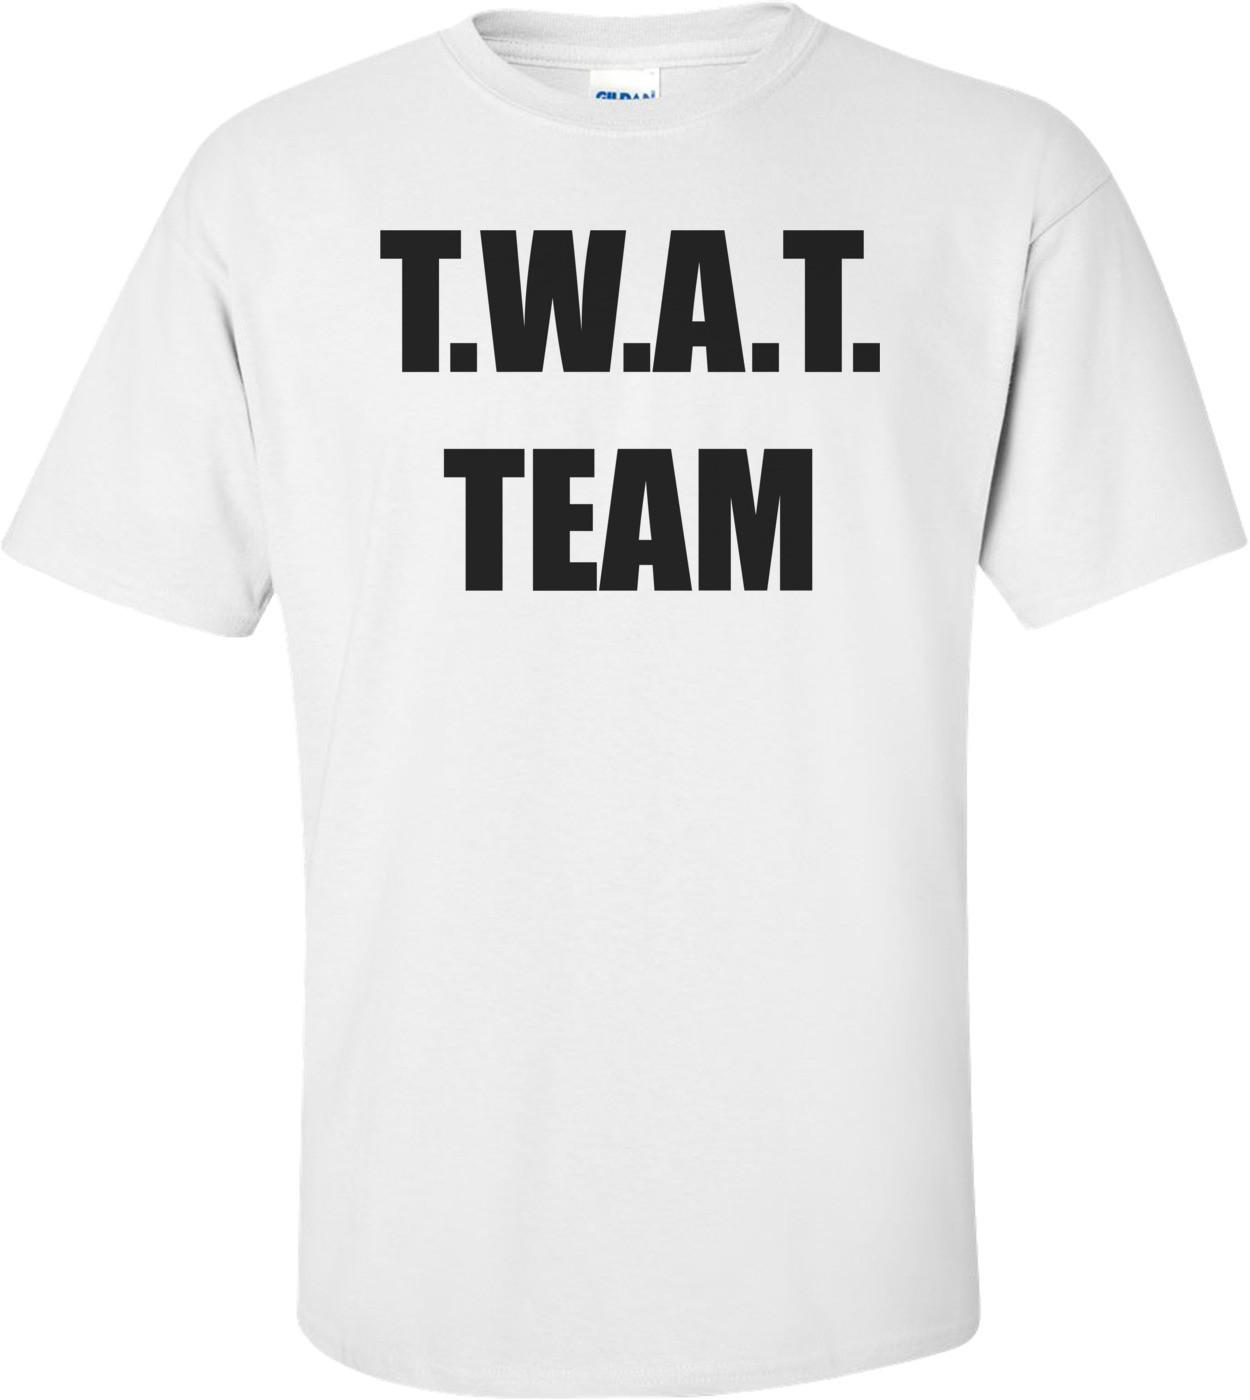 T.W.A.T. TEAM Shirt